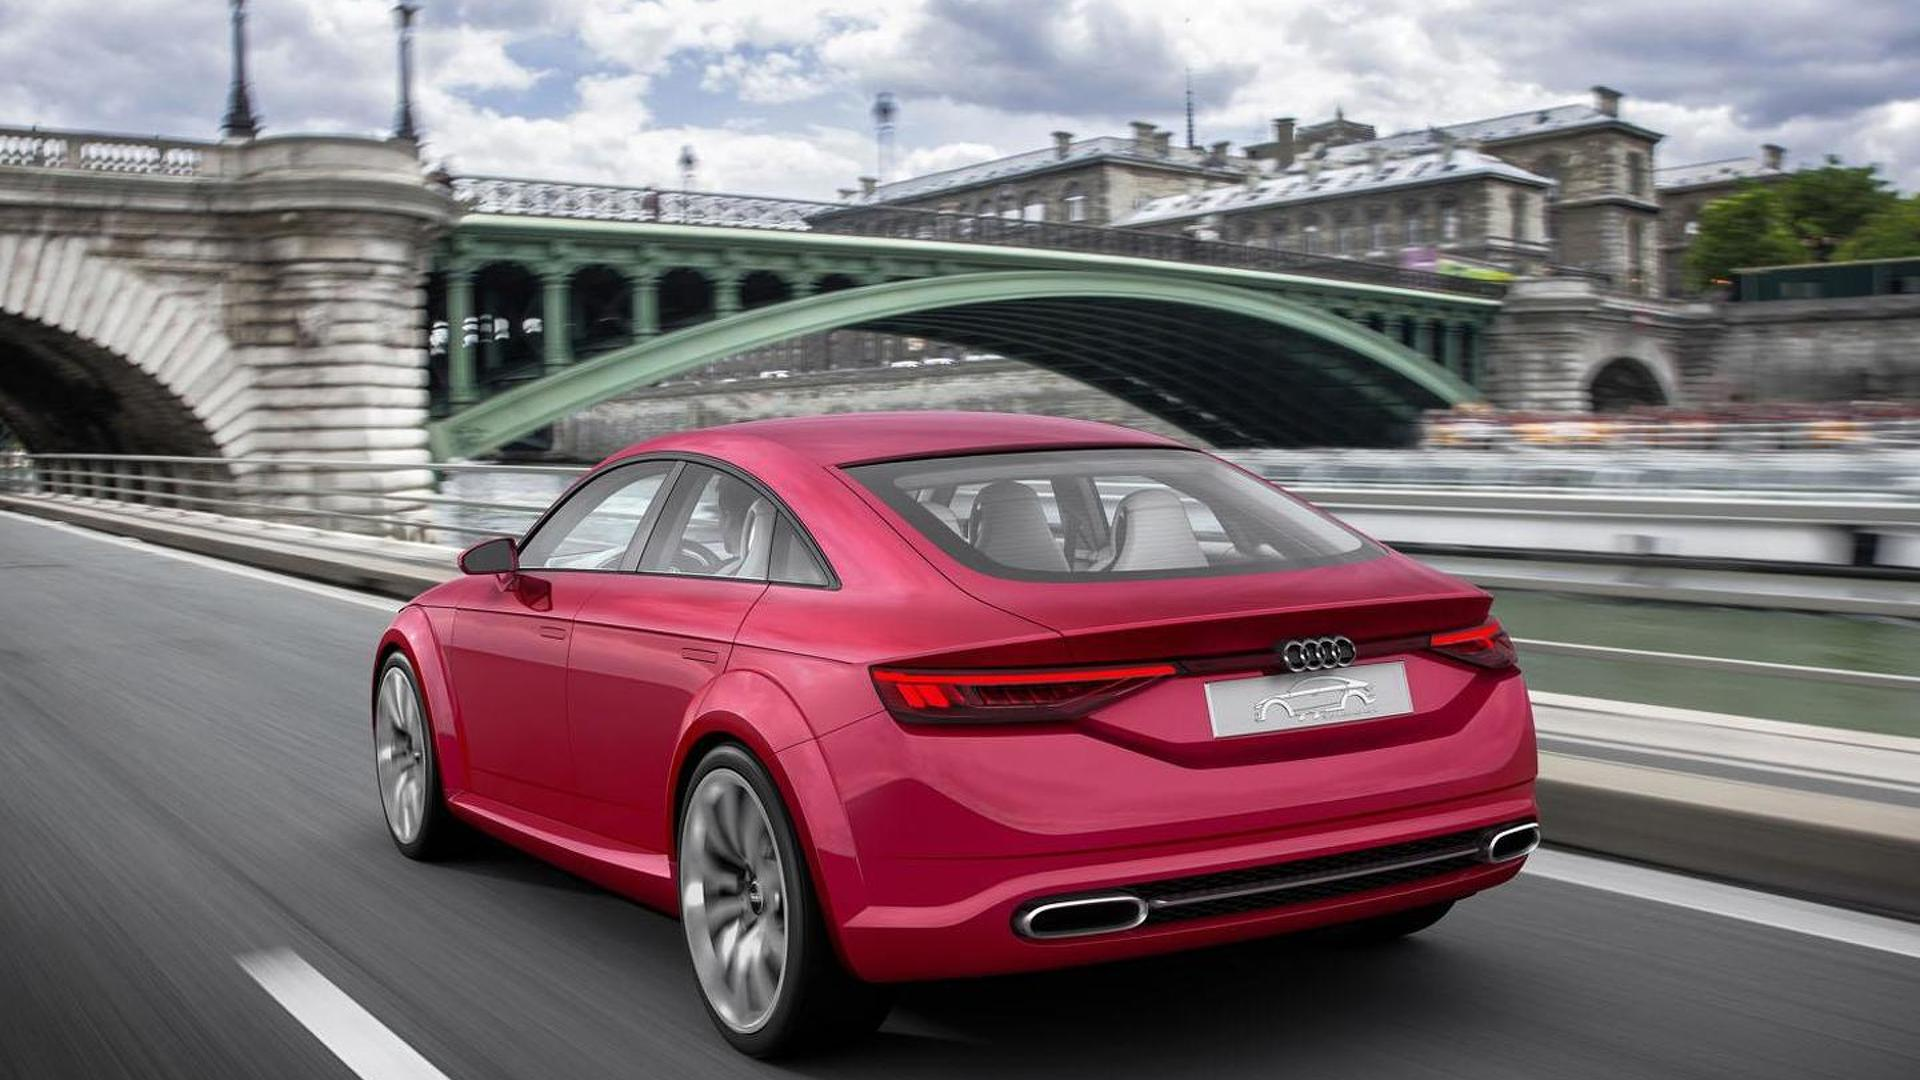 Четырёхдверное купе Audi TT Sportback